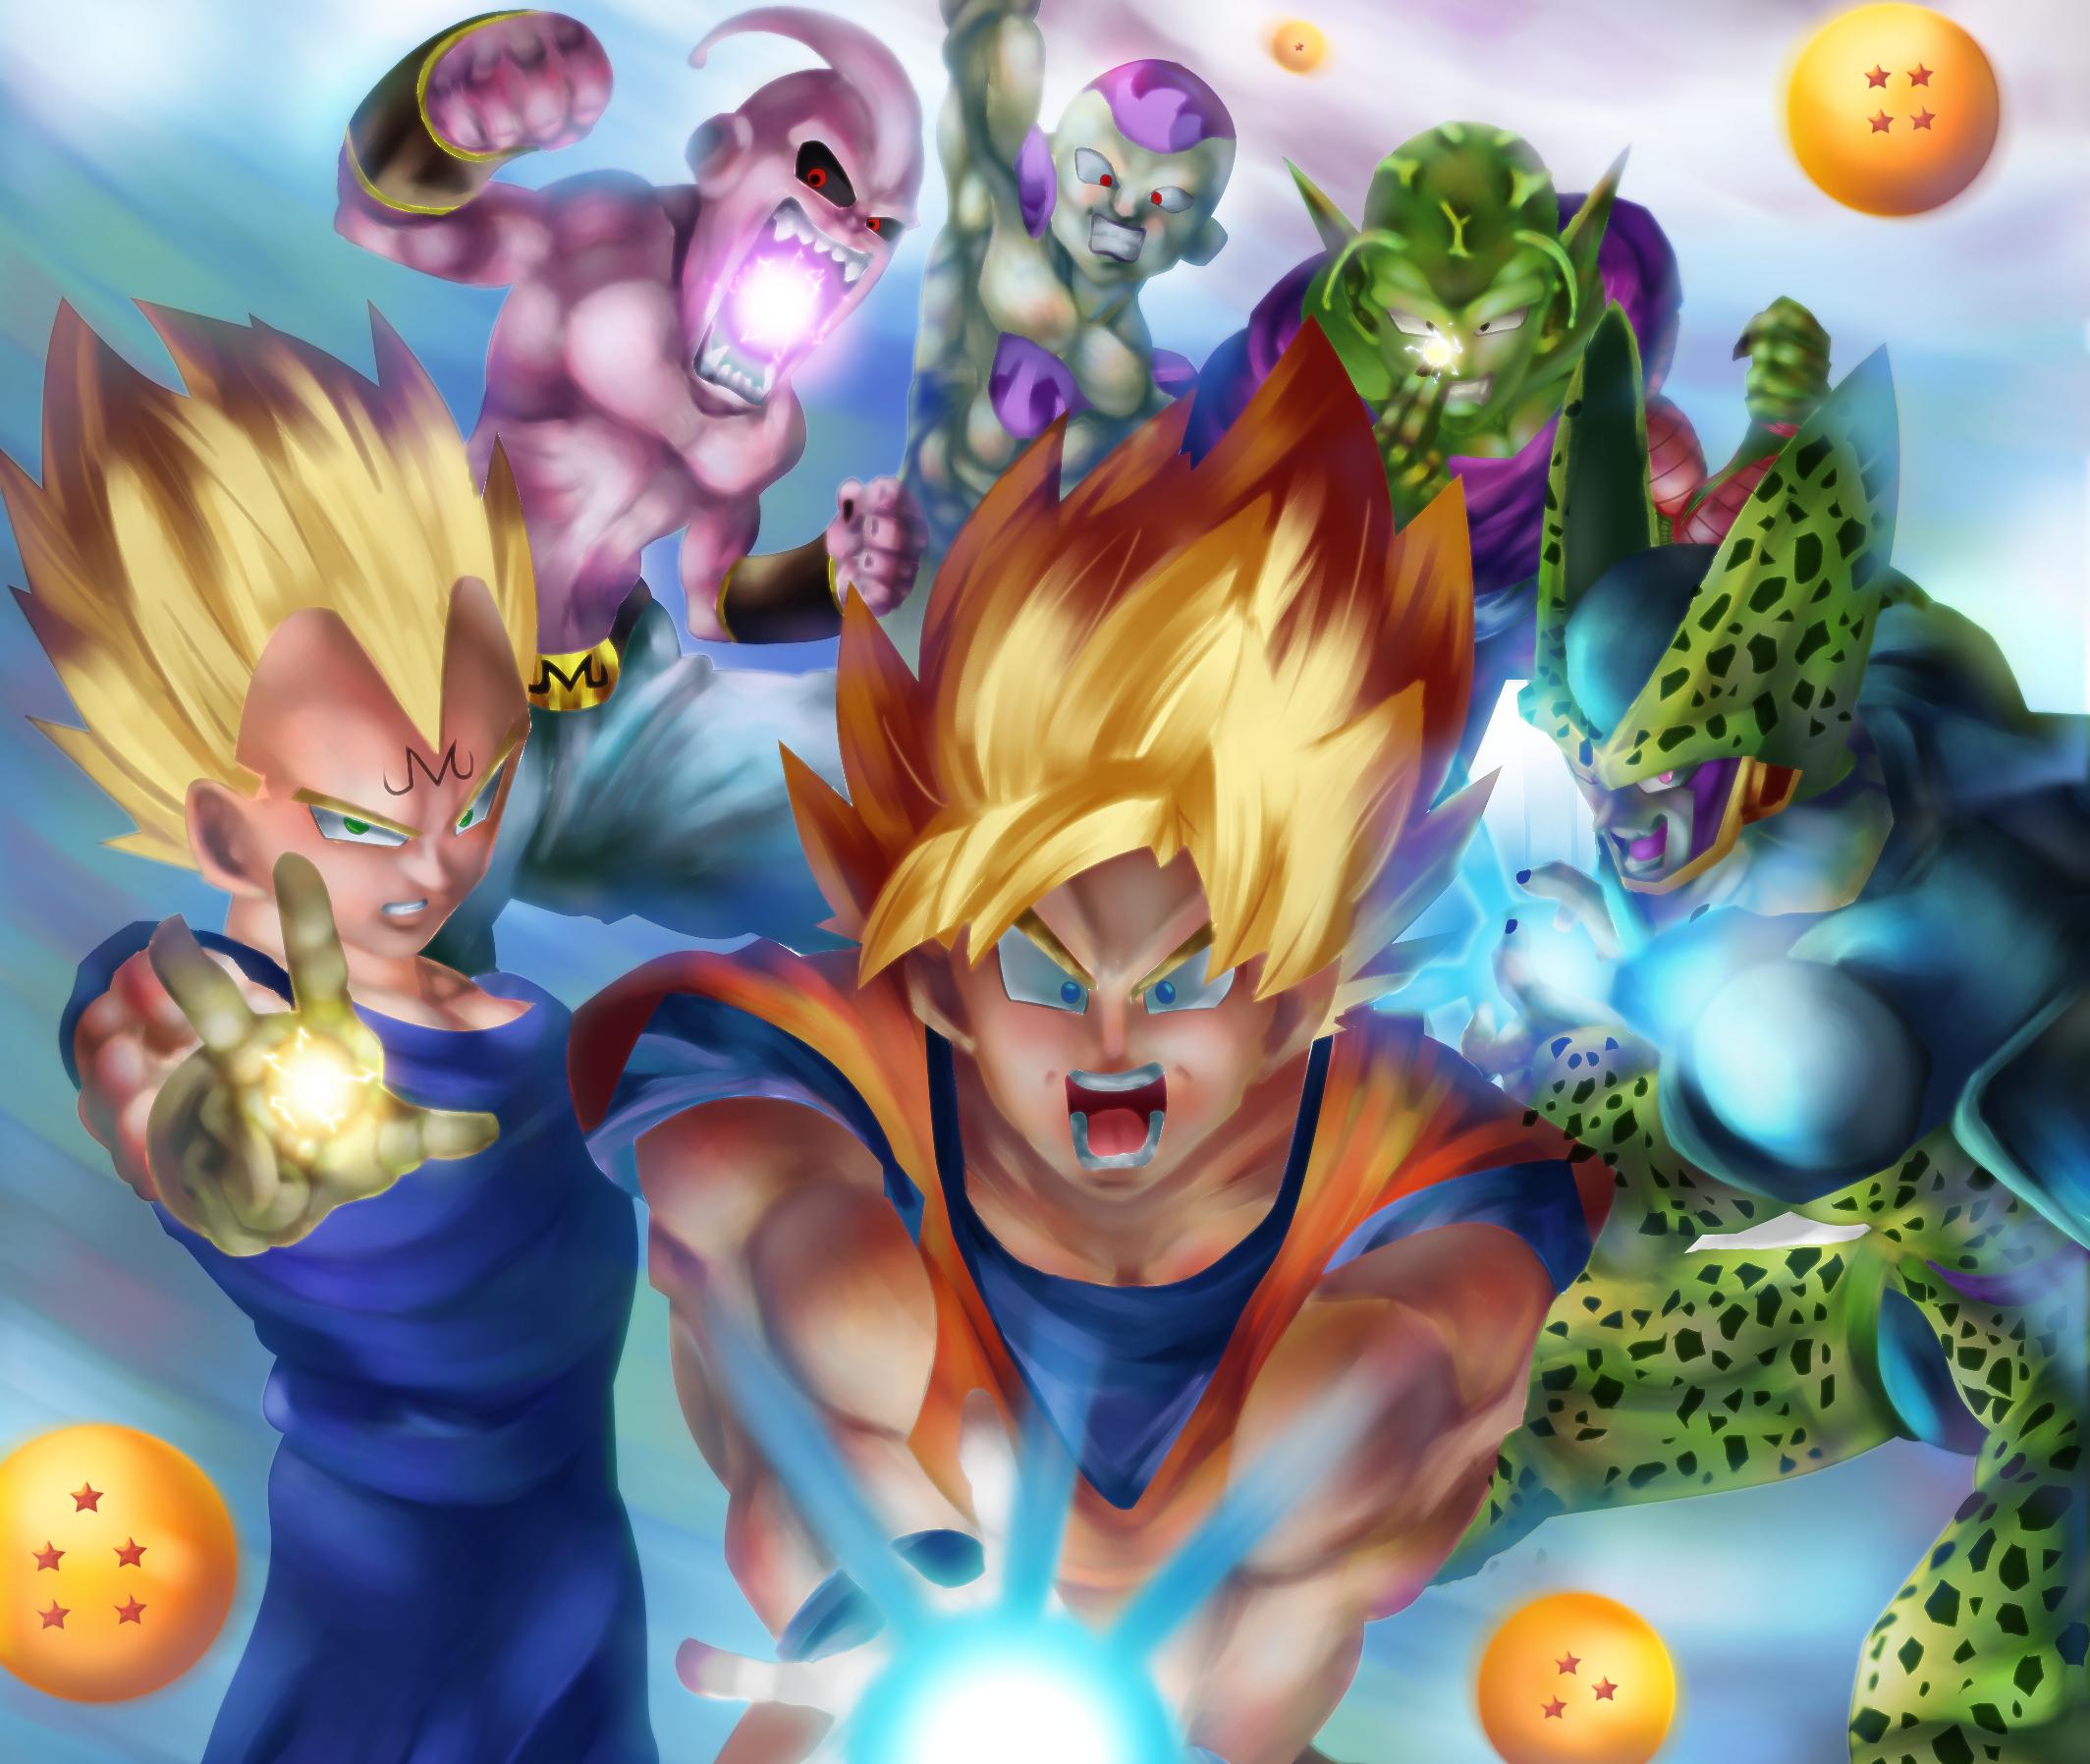 Dragon Ball Z Fond d'écran HD | Arrière-Plan | 2128x1796 | ID:957421 - Wallpaper Abyss